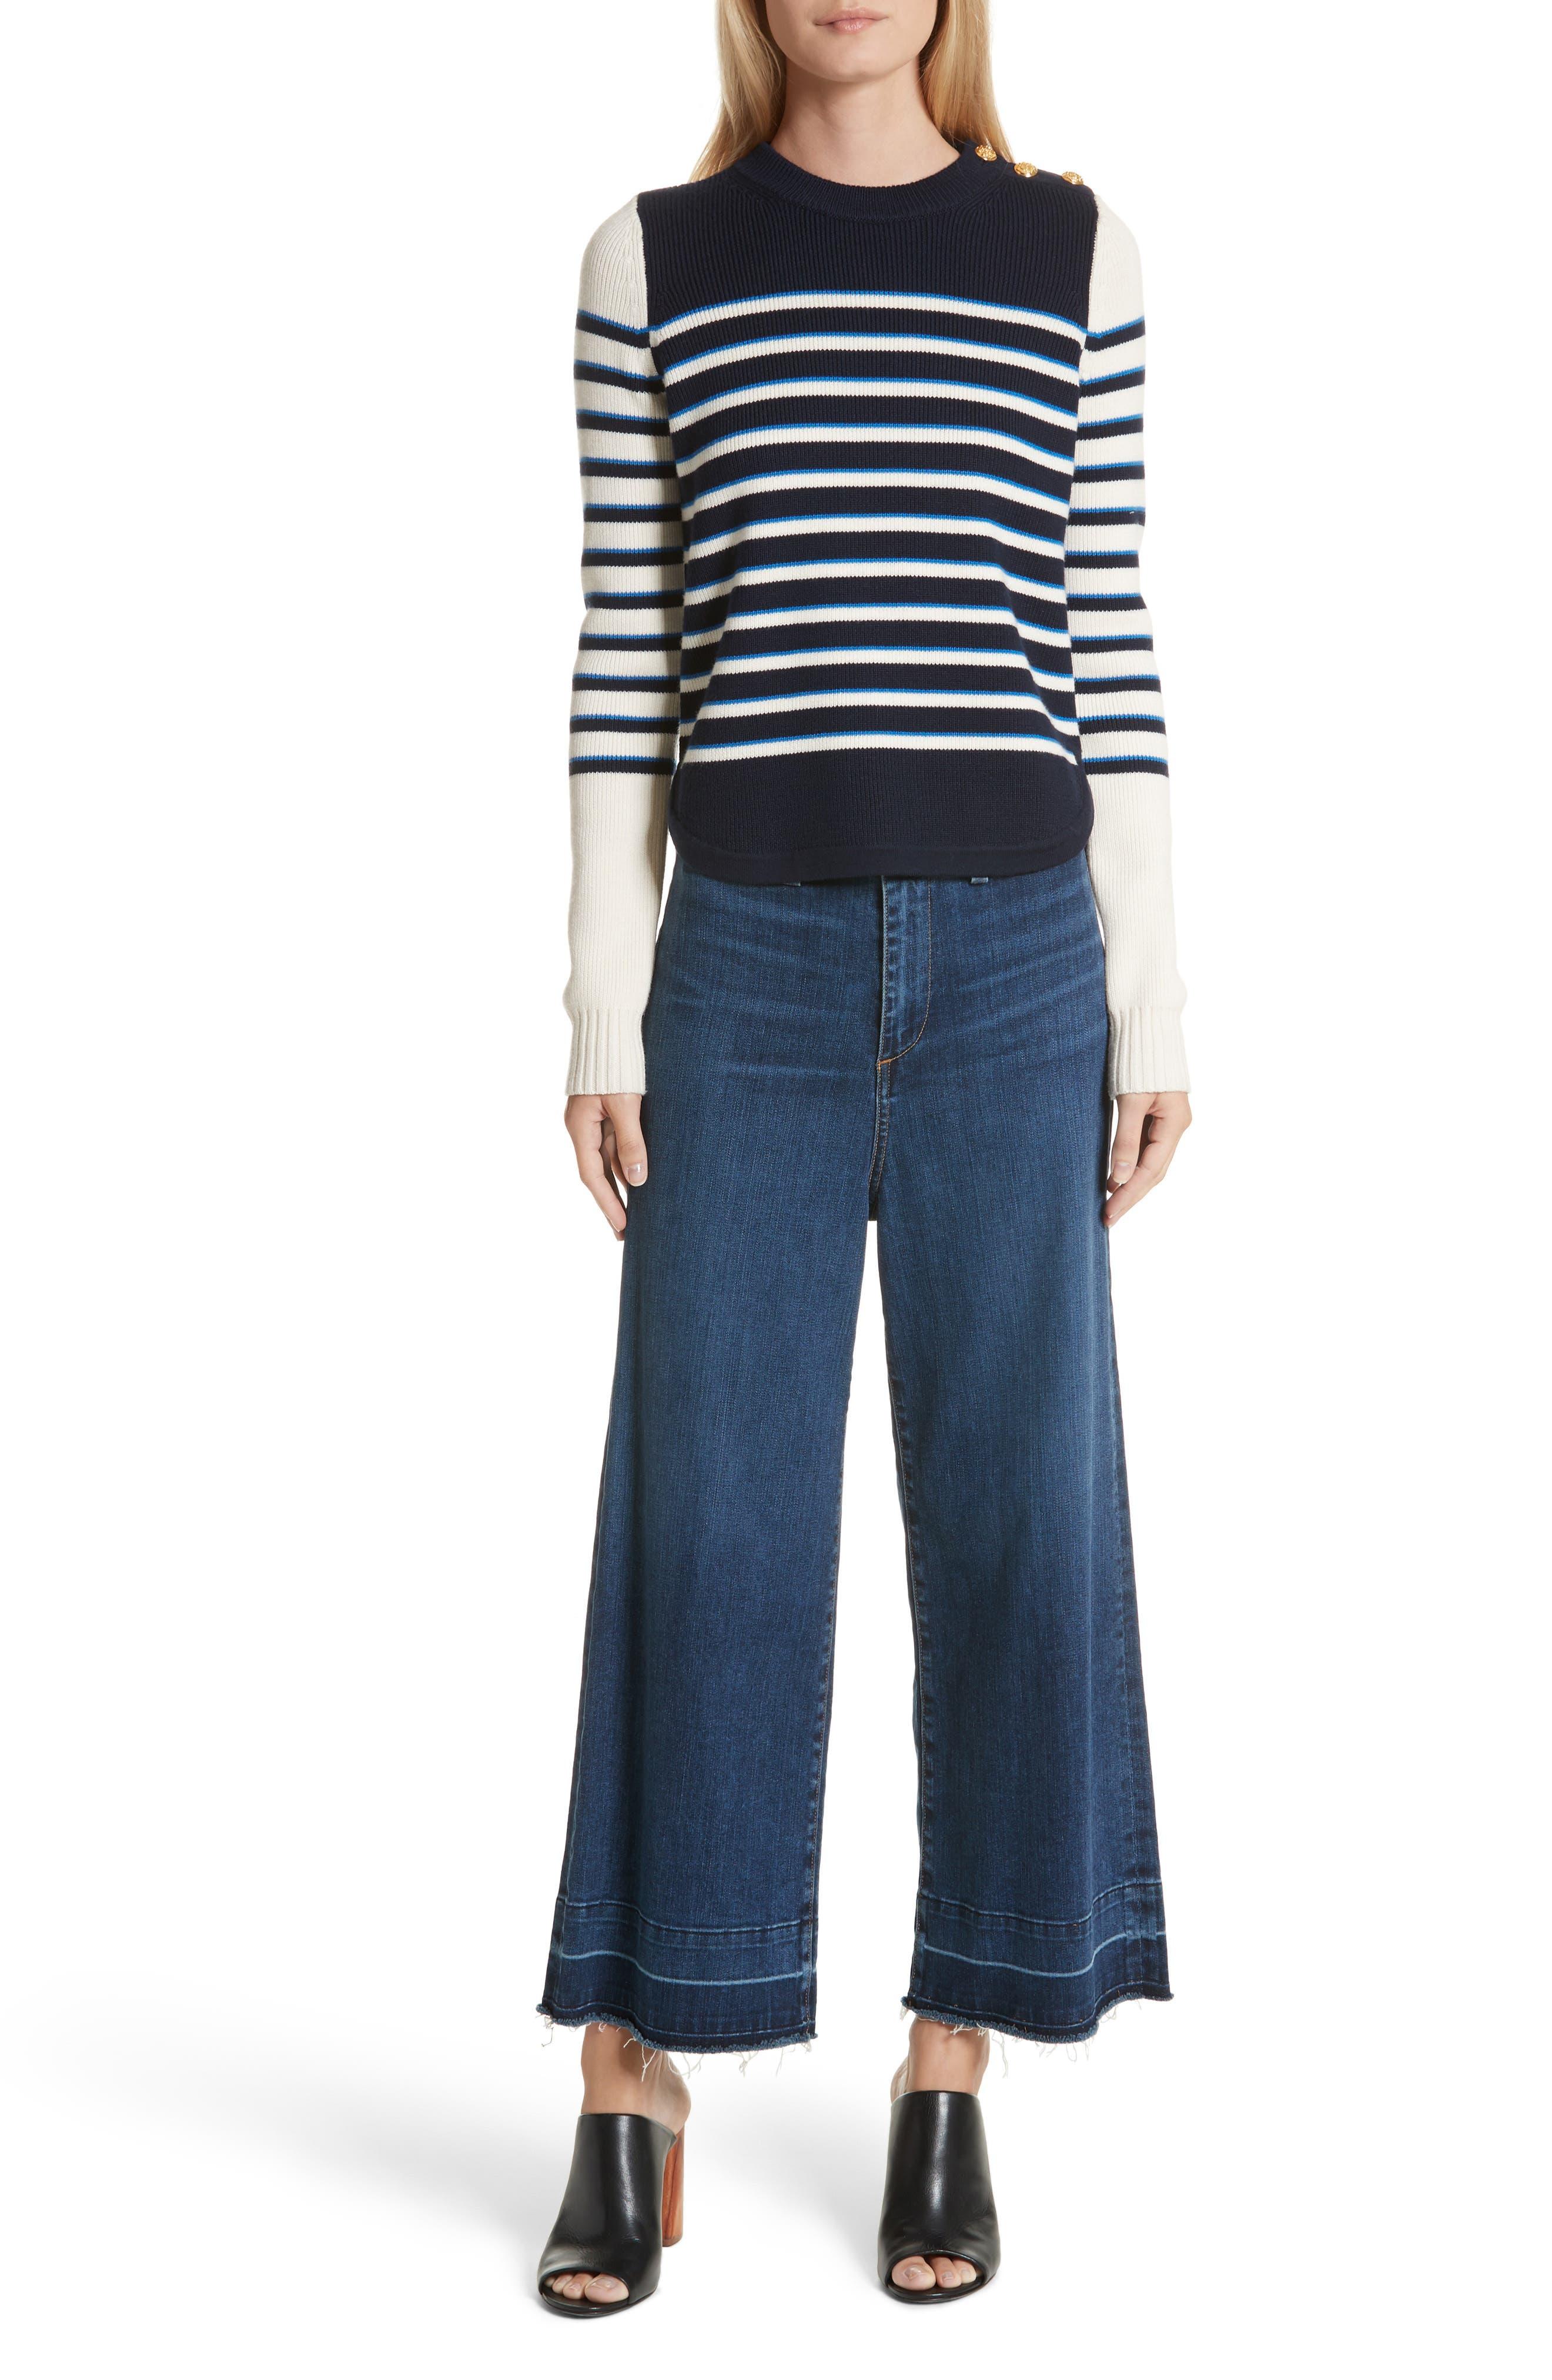 Amos Stripe Merino Wool Sweater,                             Alternate thumbnail 7, color,                             Navy/ Ivory/ Blue